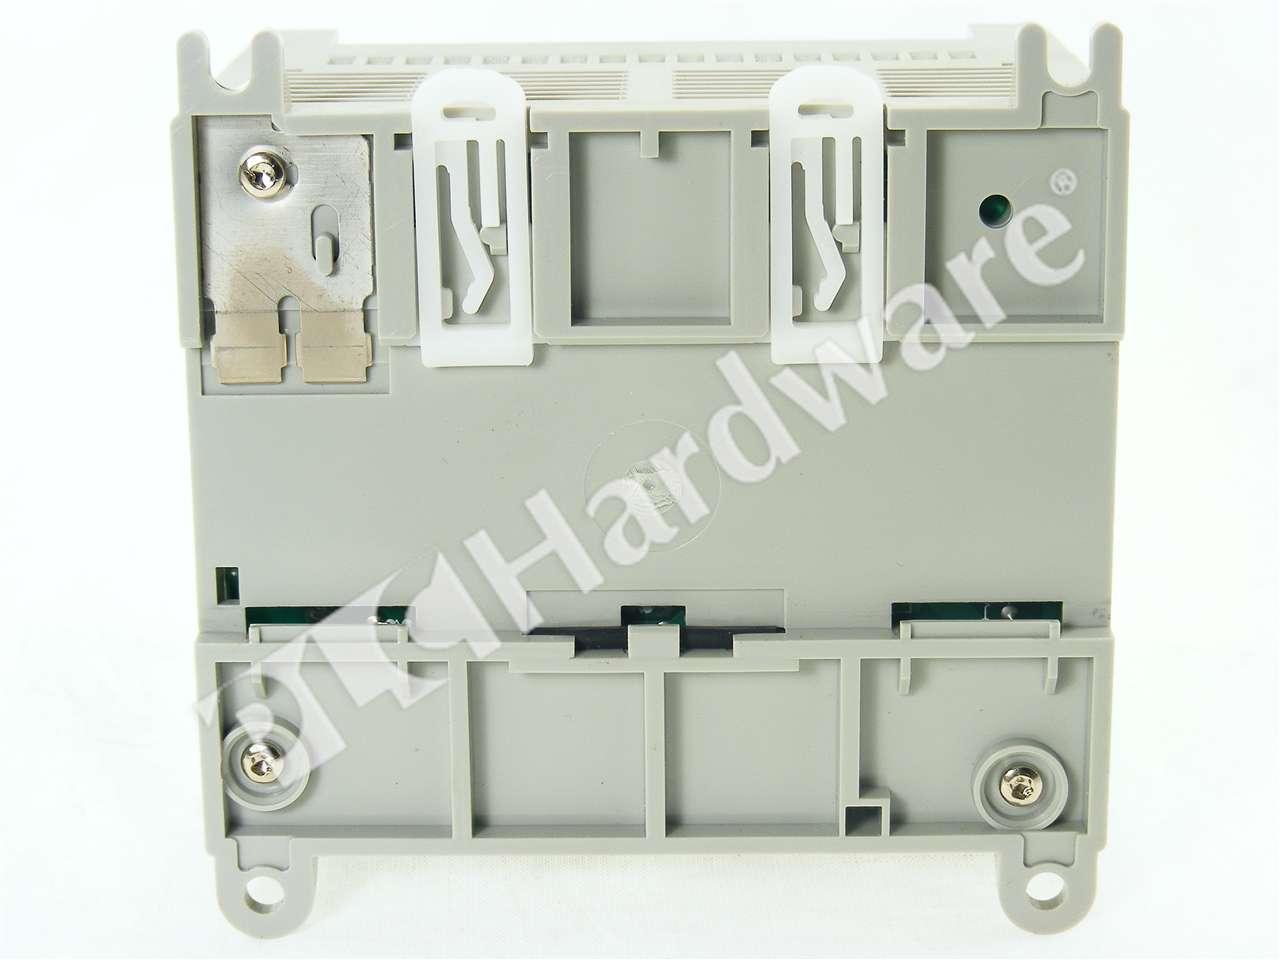 PLC Hardware - Allen Bradley 1763-L16BBB Series A, Used in a PLCH ...